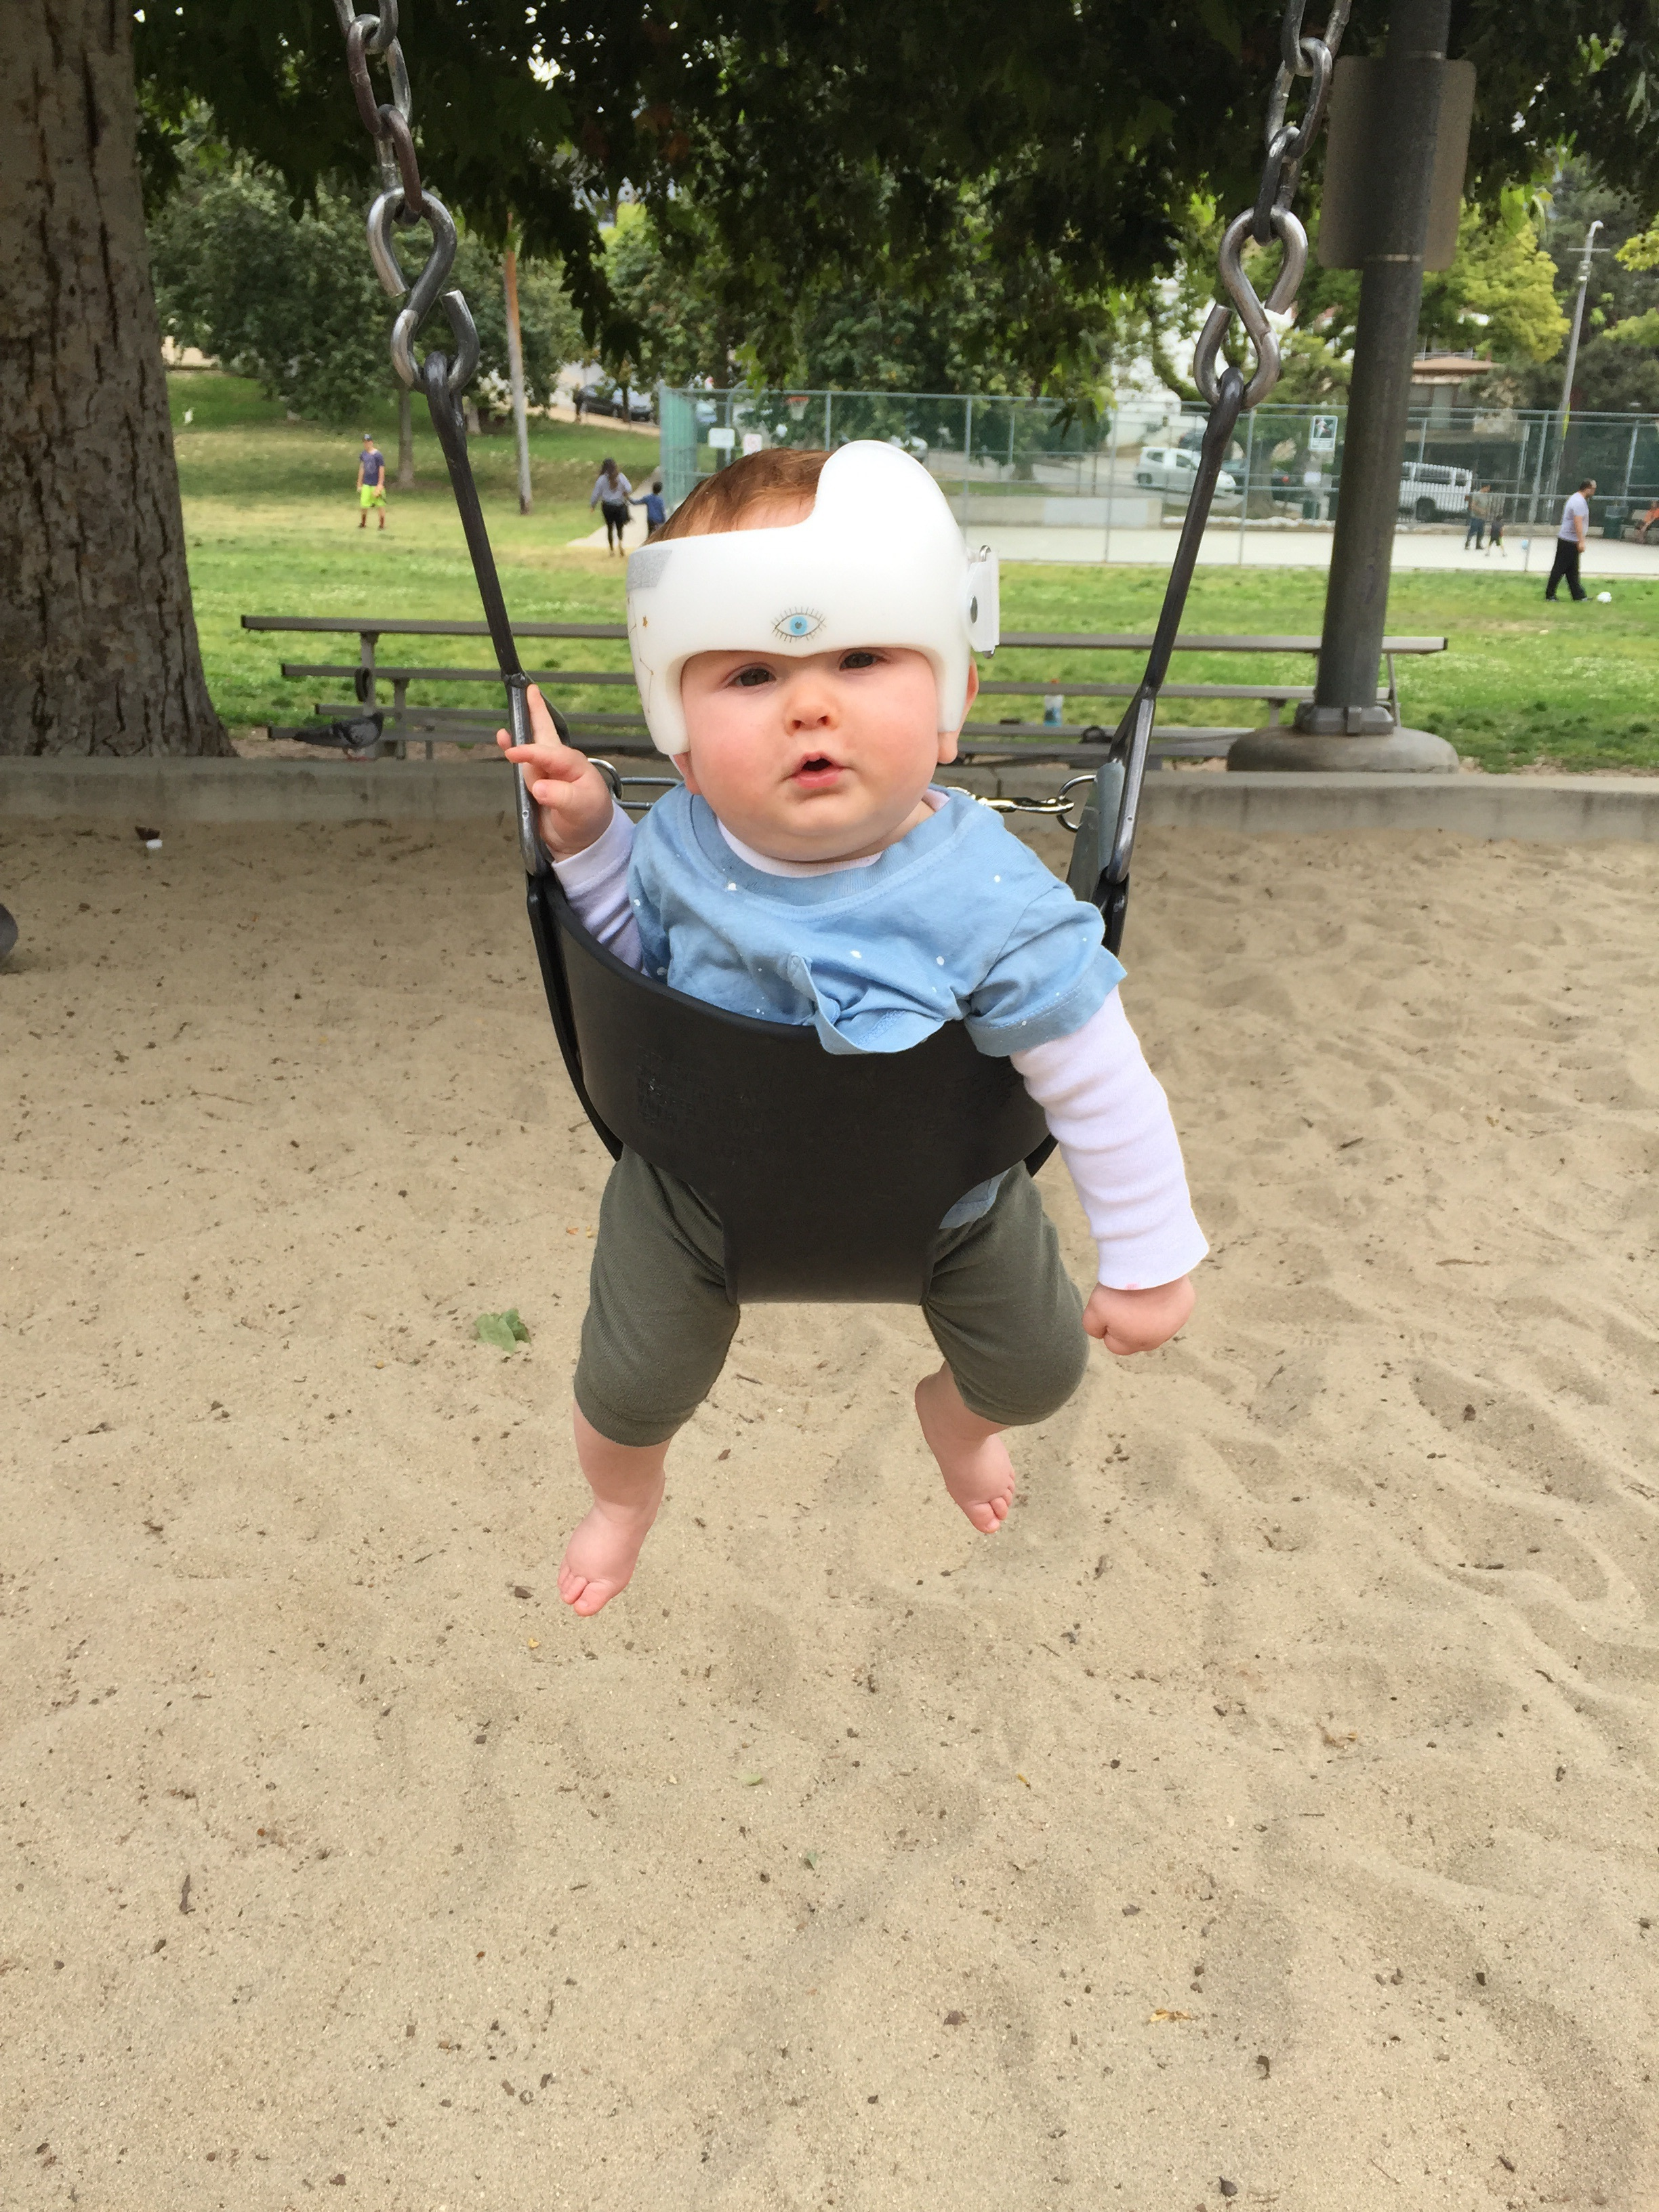 Nico took to swinging quickly